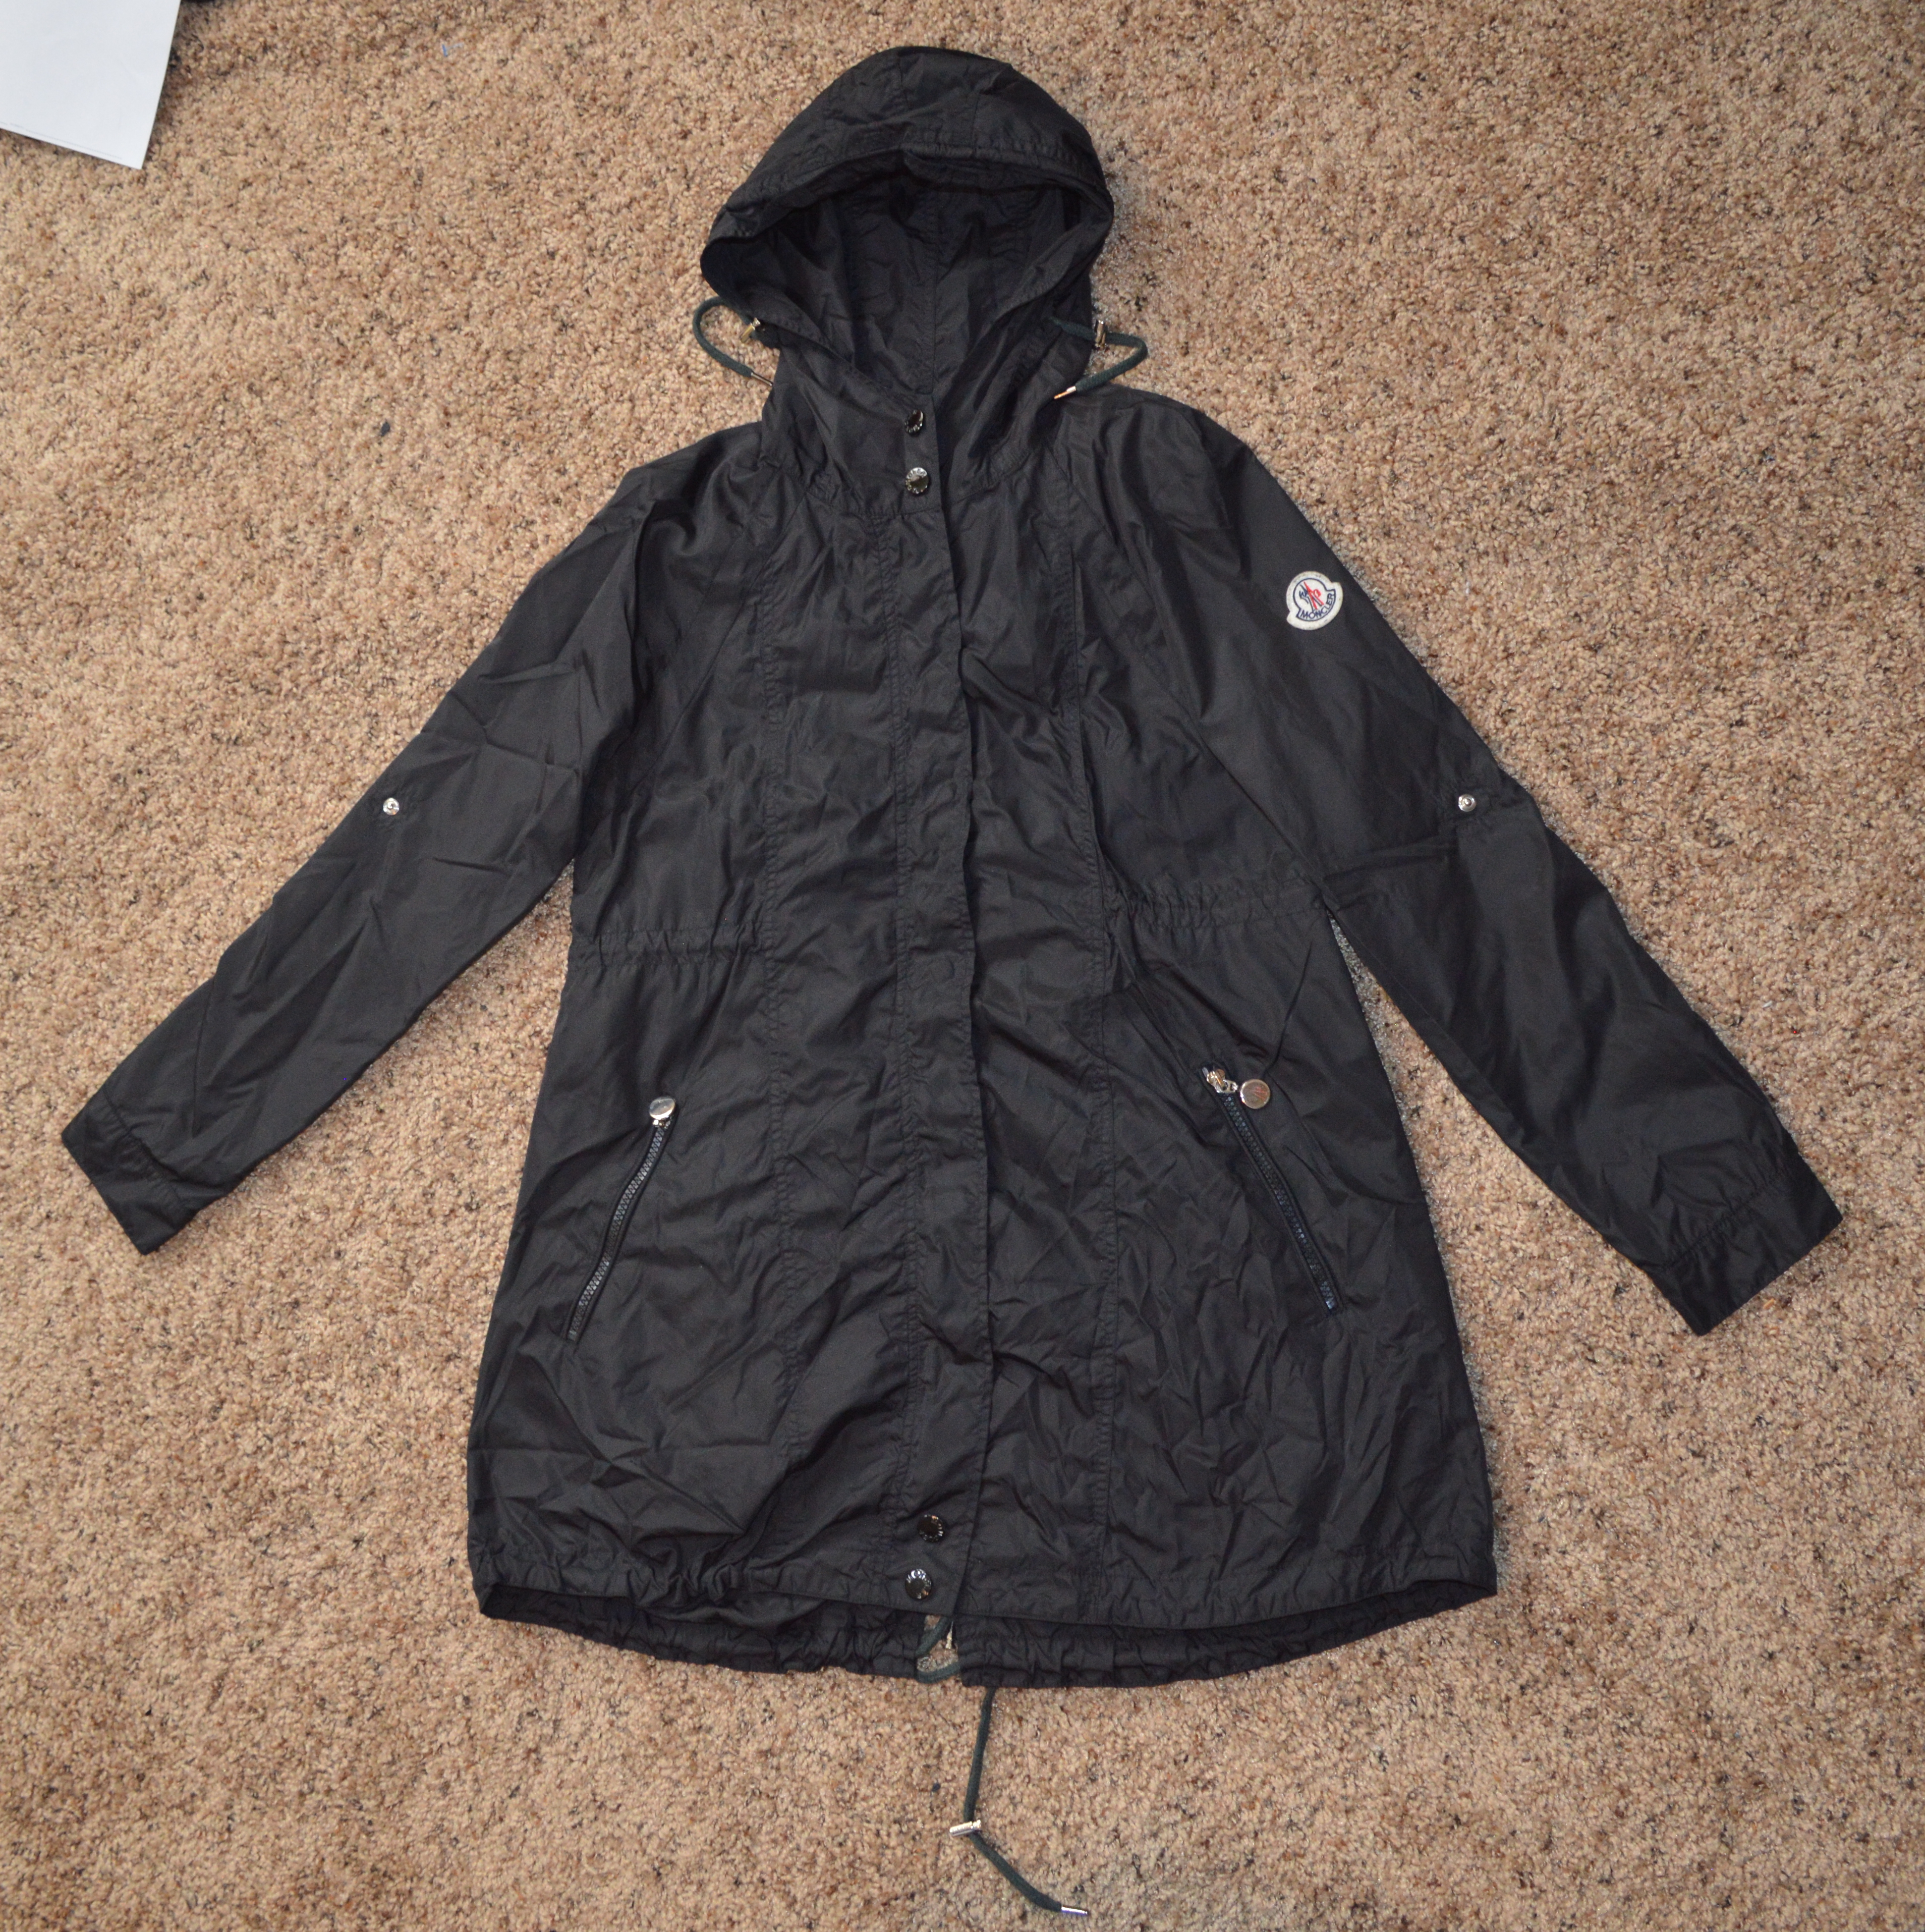 825bb97a6 Vintage Women's Moncler Maglione Tricot Gilet Fishtail Parka Adjustable  Sleeve Light Jacket